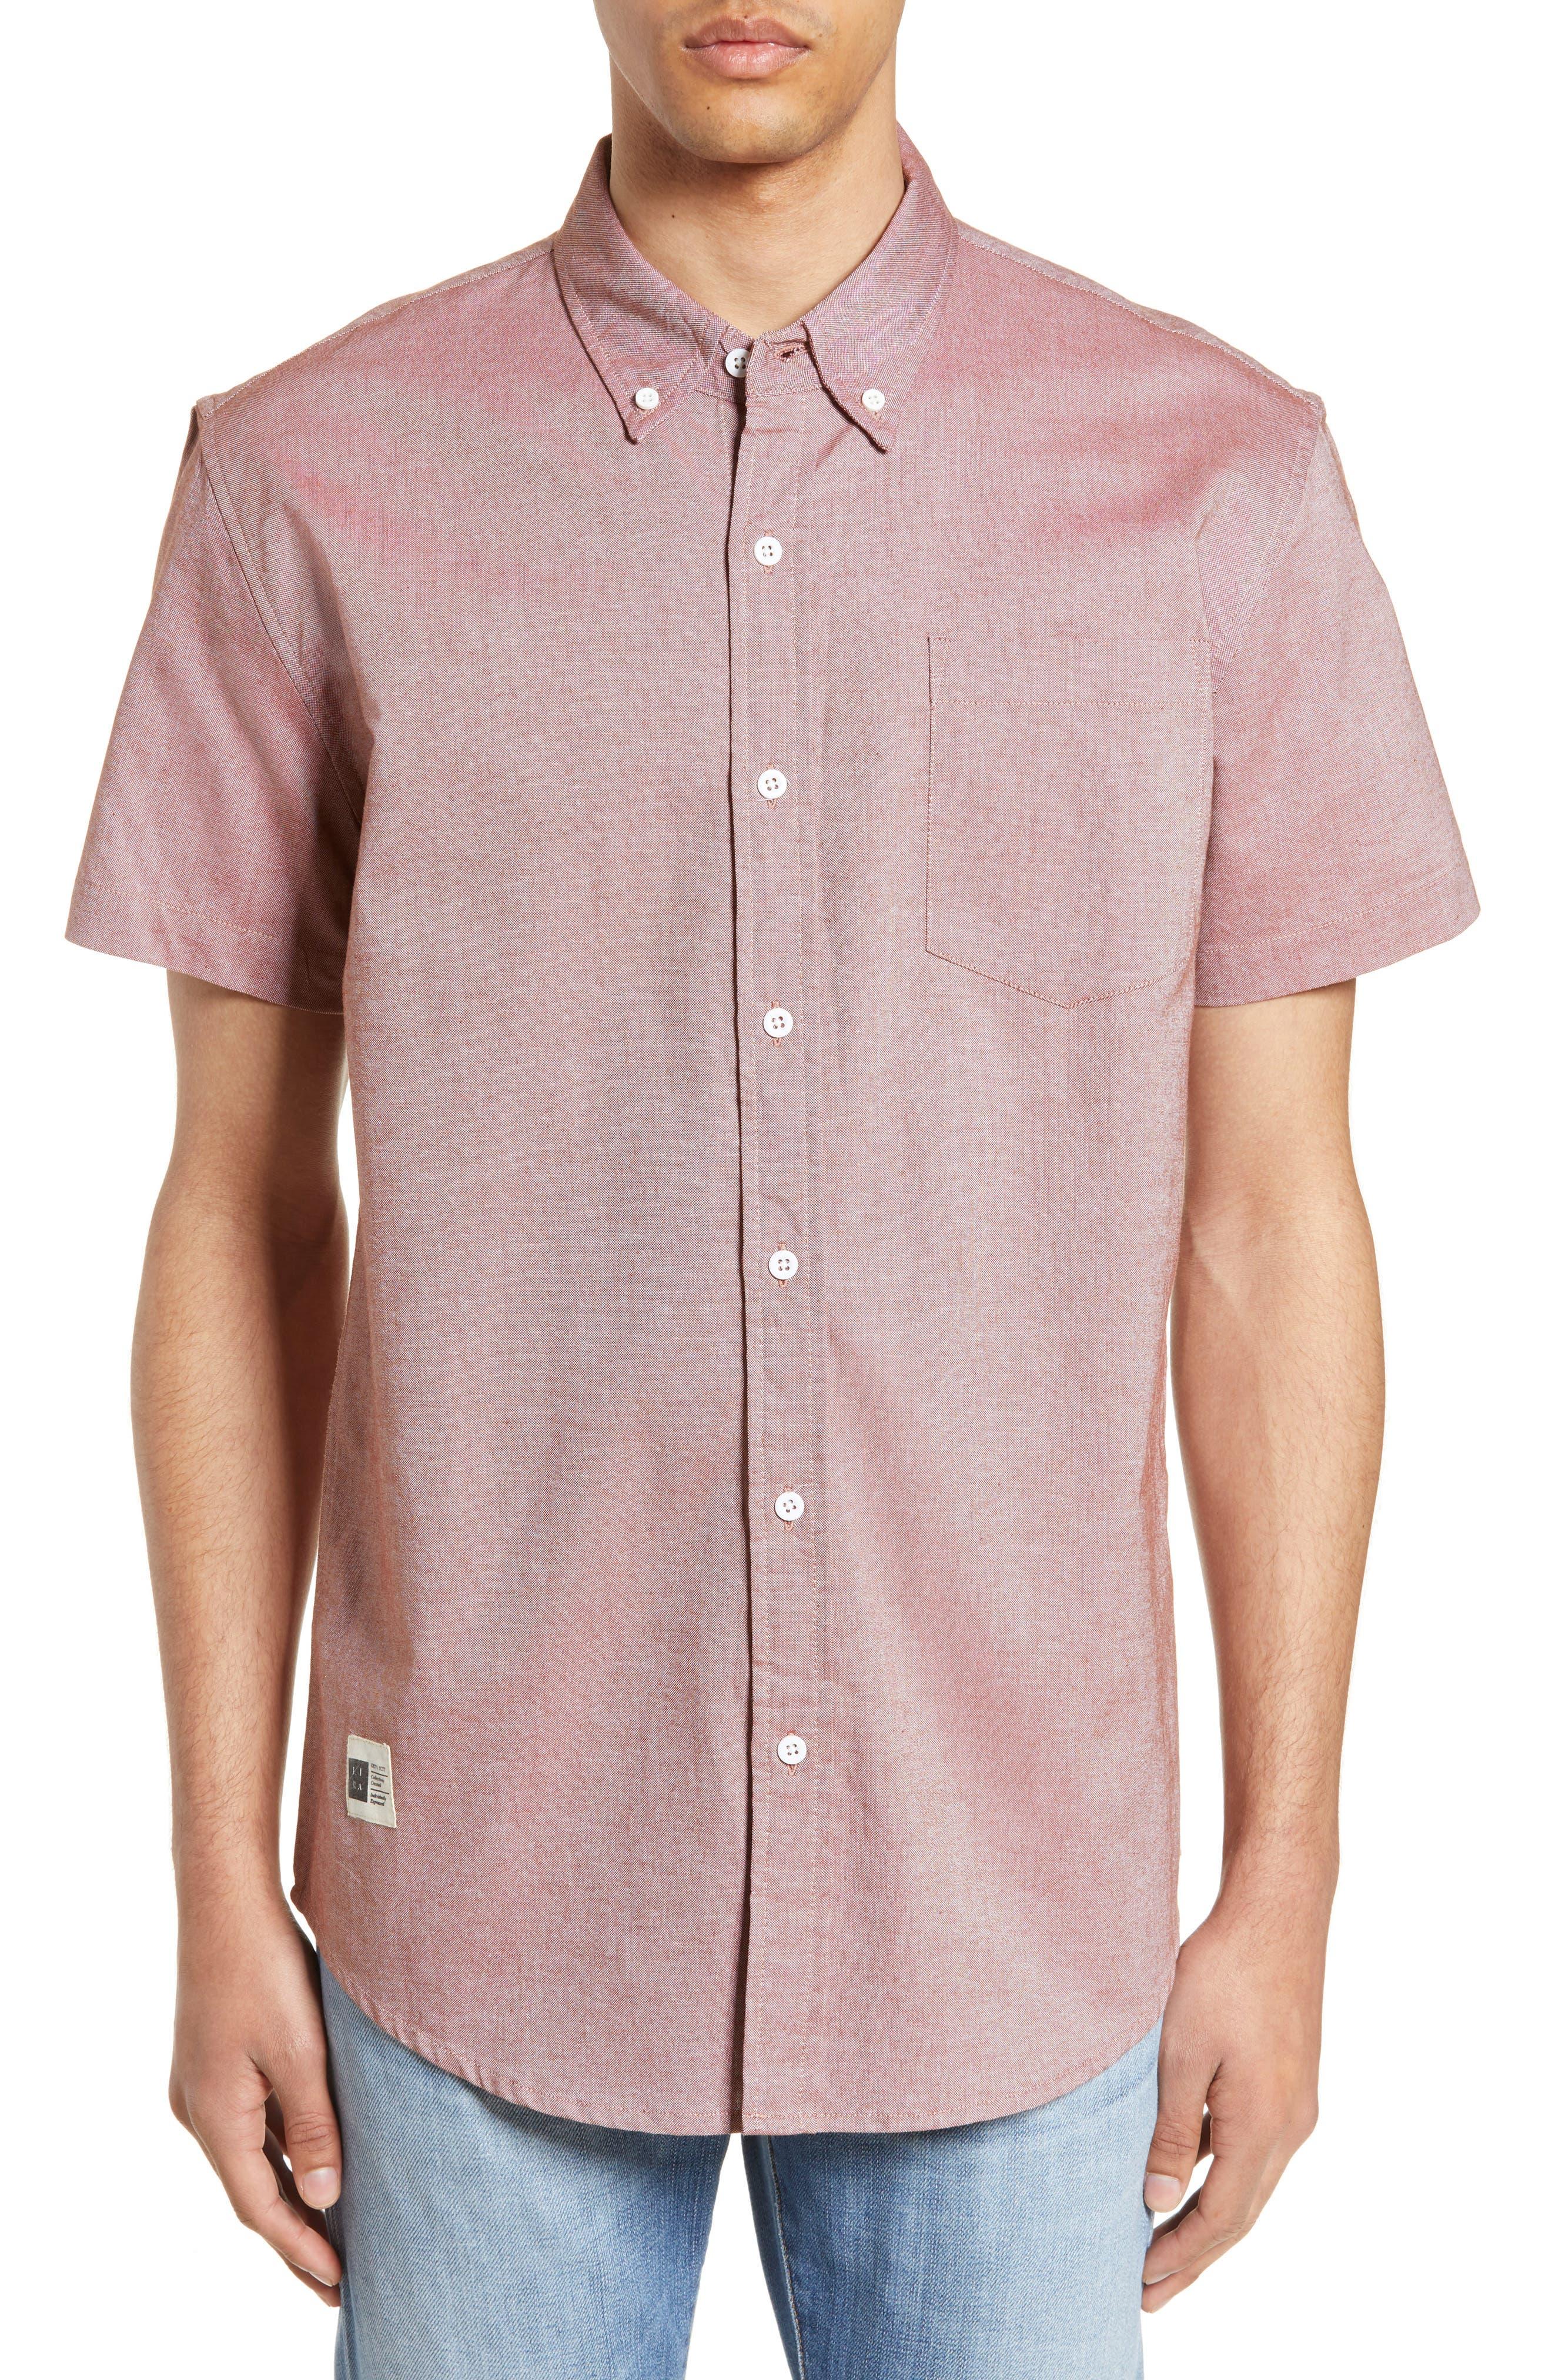 Lira Clothing Short Sleeve Cotton Sport Shirt, Red